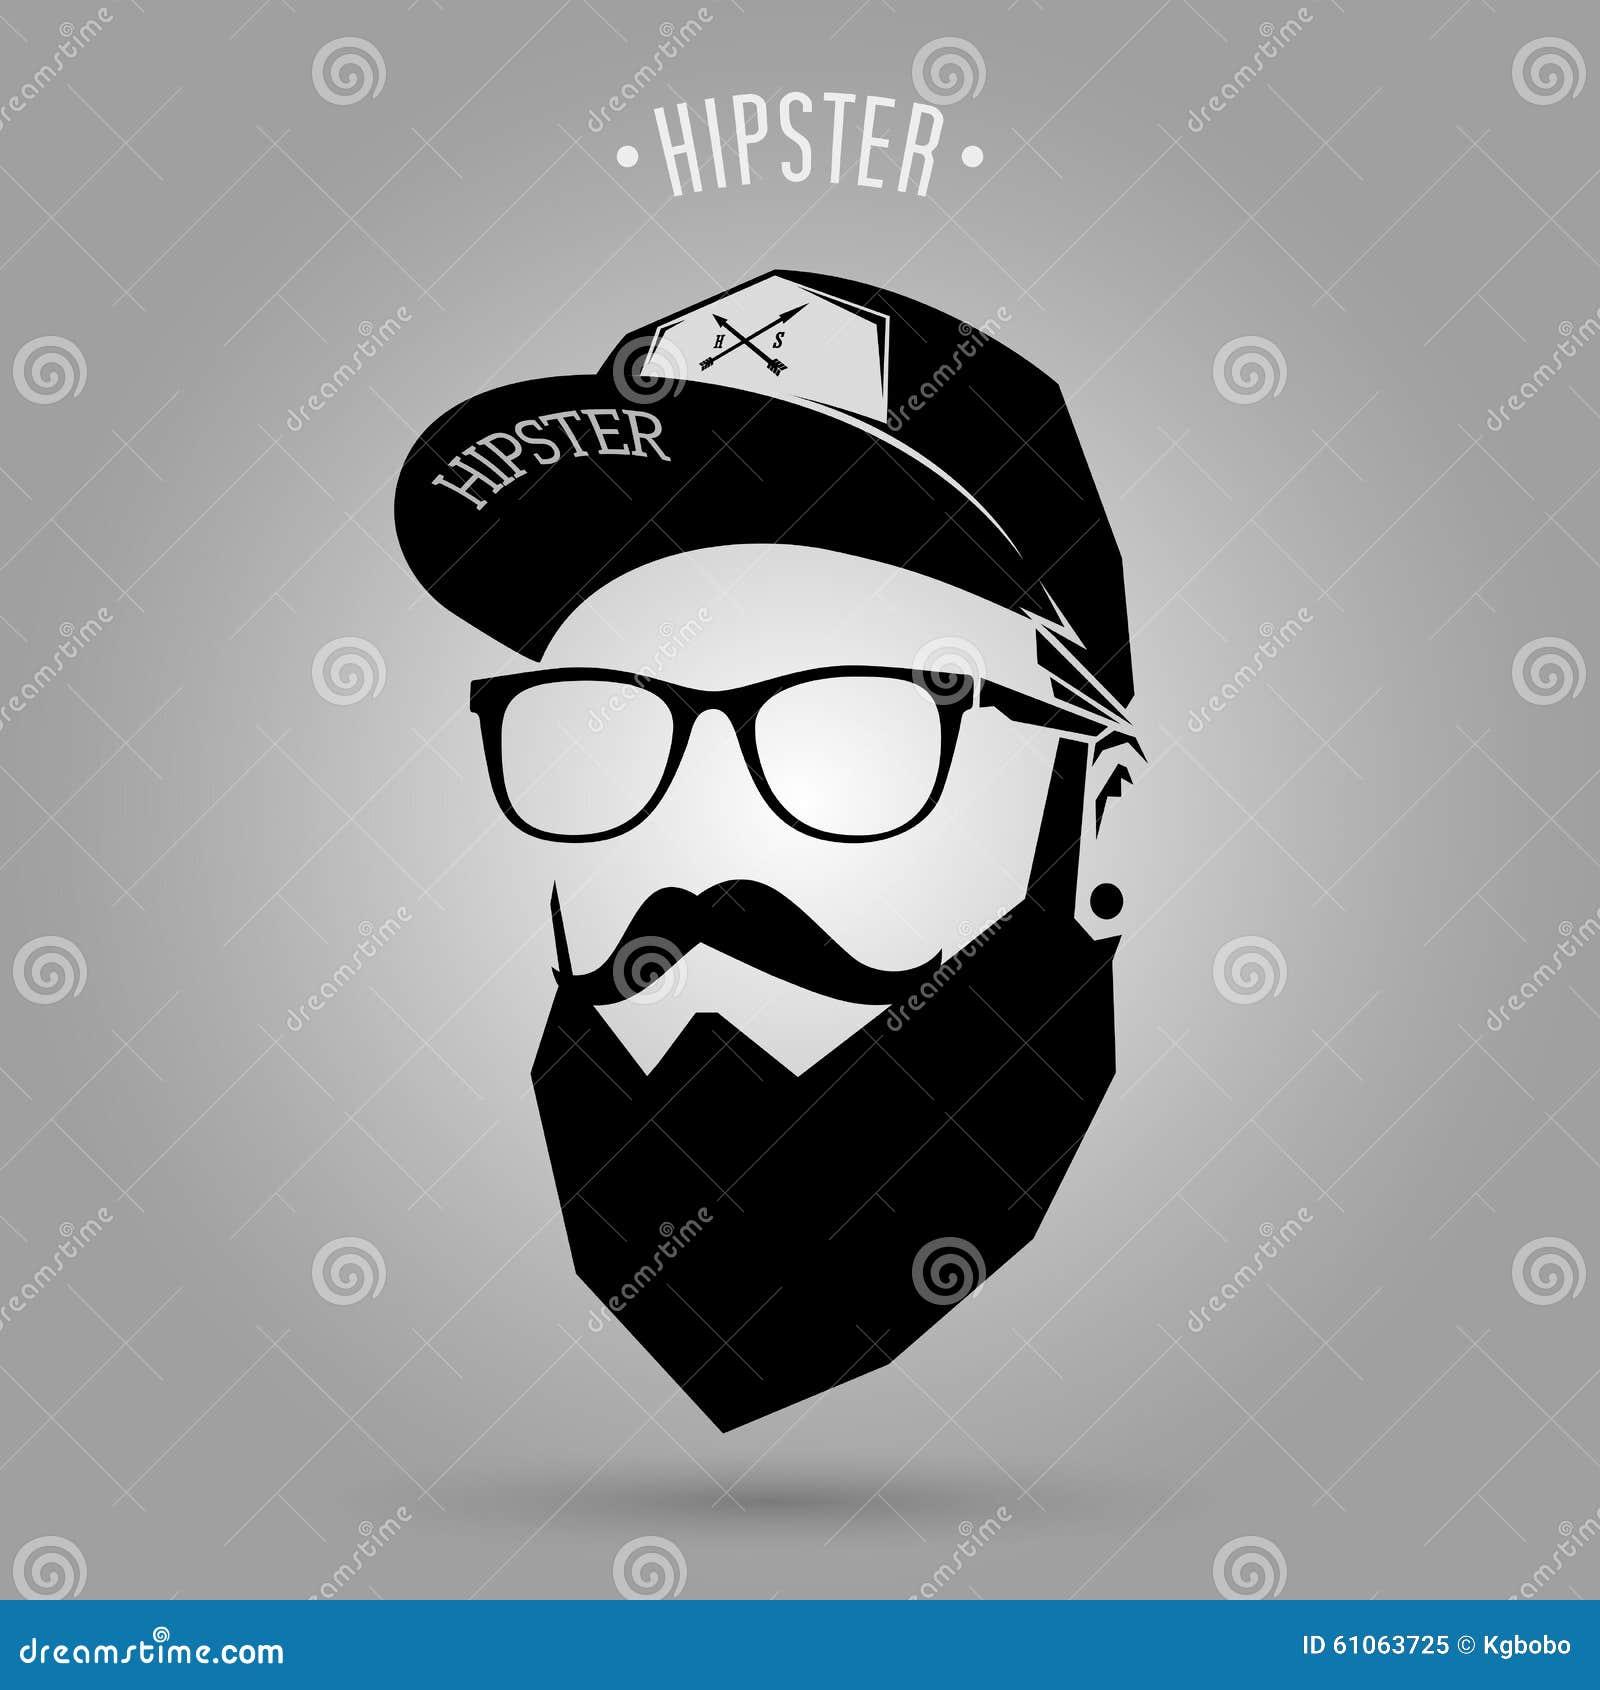 Hipster Men Cap Stock Vector - Image: 61063725